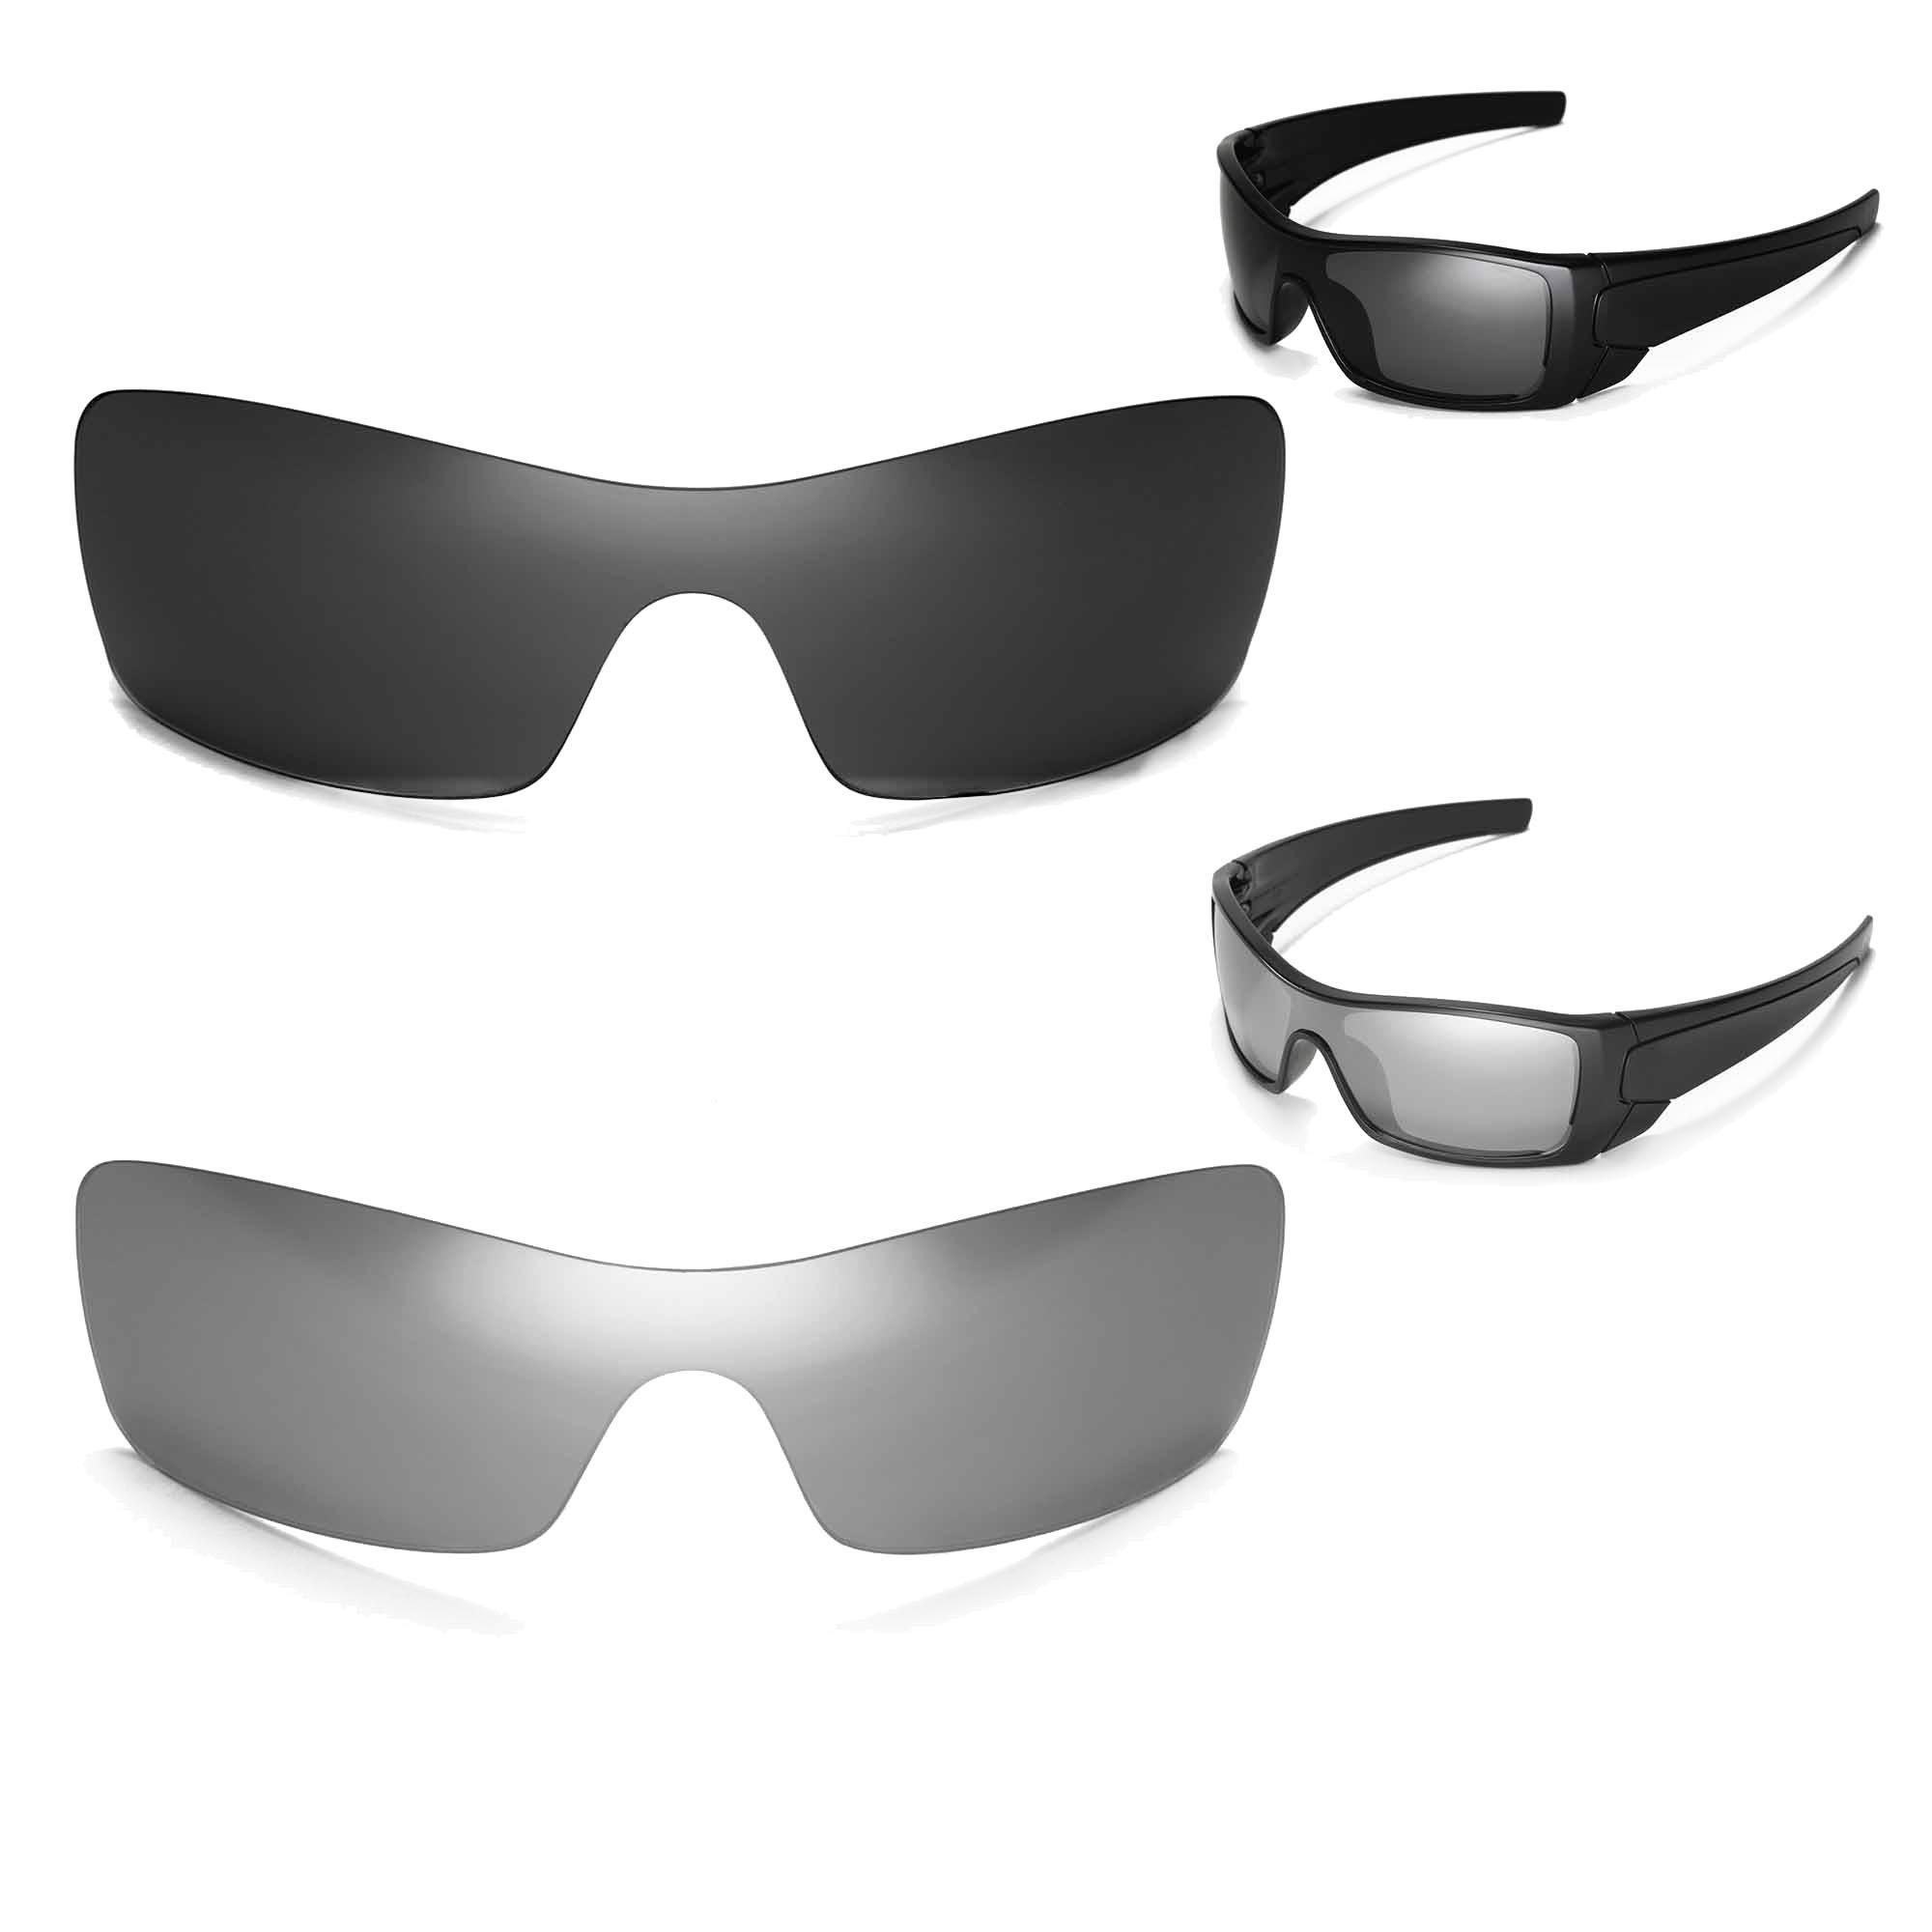 New Walleva Polarized Black + Titanium Lenses For Oakley Batwolf